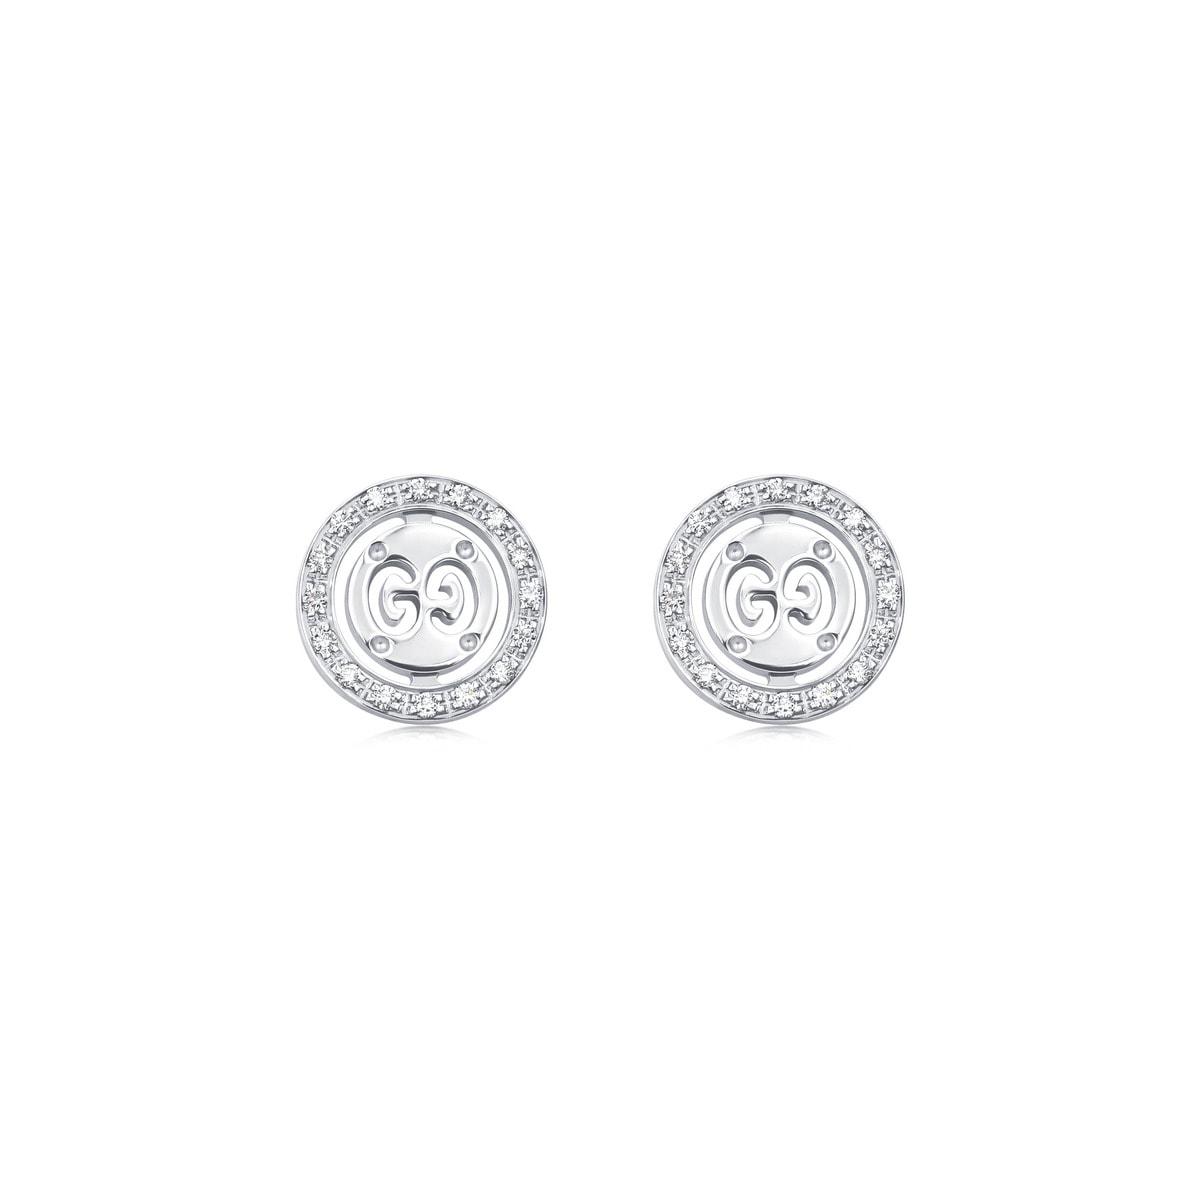 adc1b39ef5a Gucci  Icon Twirl  18K Gold Diamond Earrings.  14